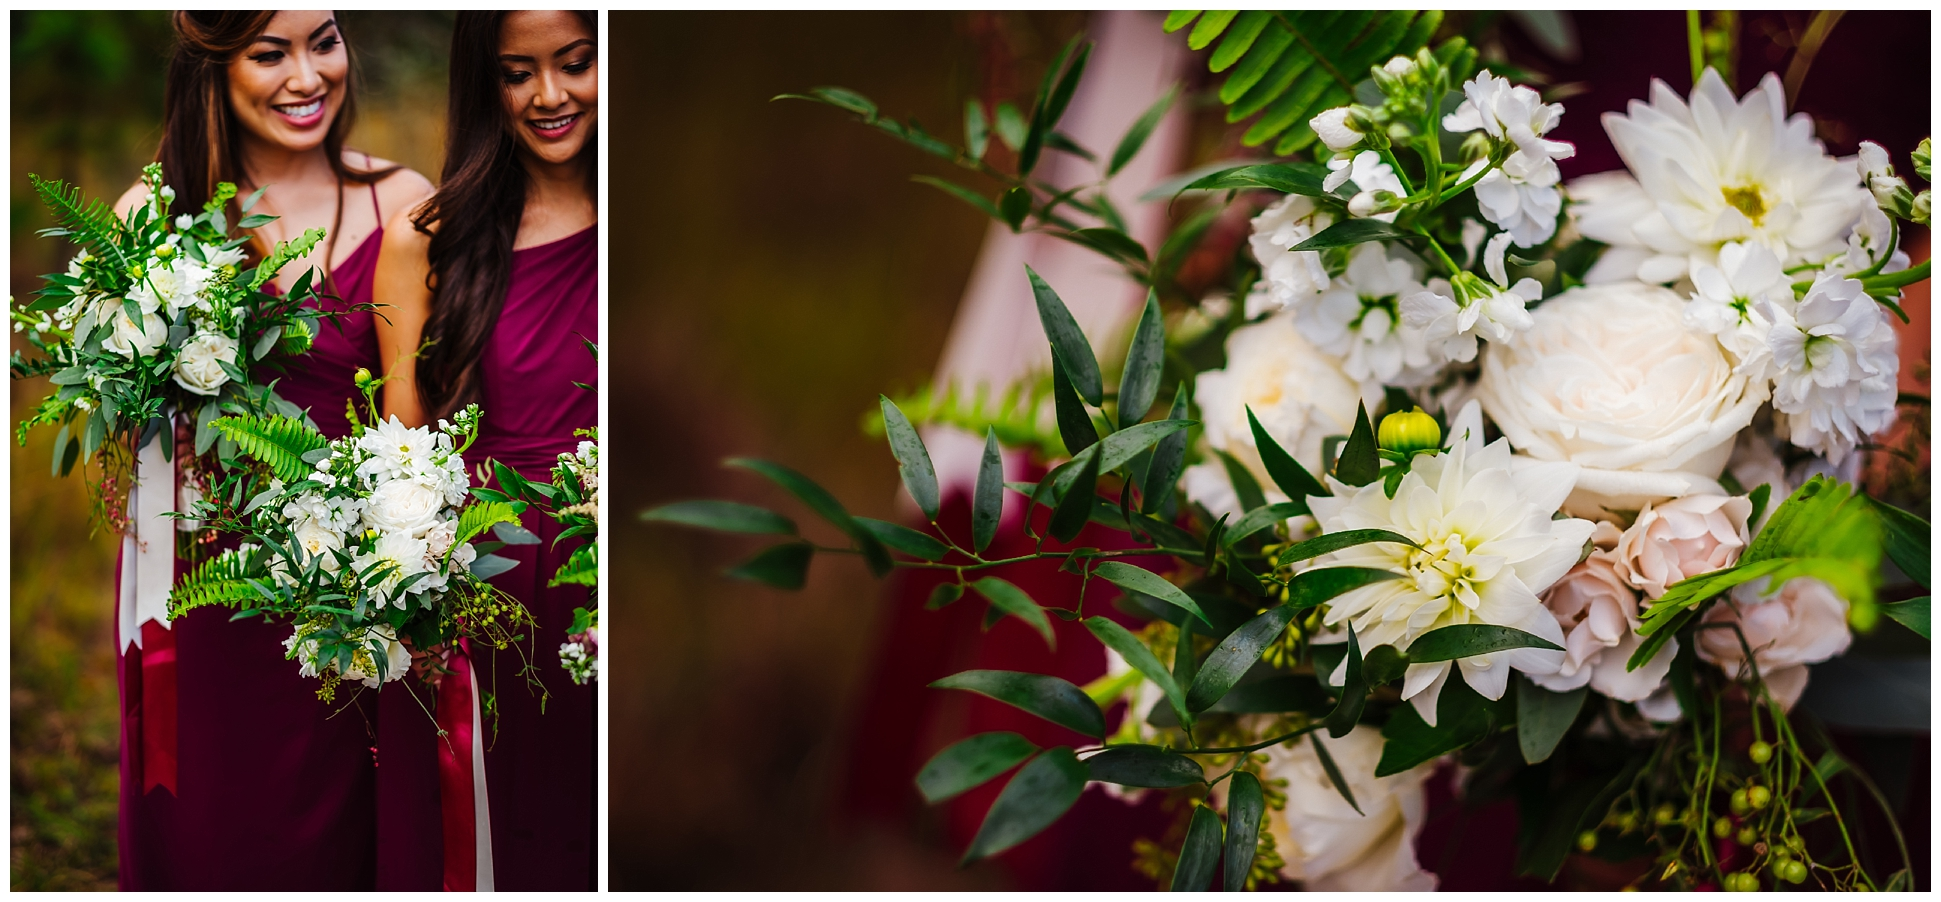 tampa-wedding-photographer-philipino-colorful-woods-ballroom-church-mass-confetti-fuscia_0048.jpg